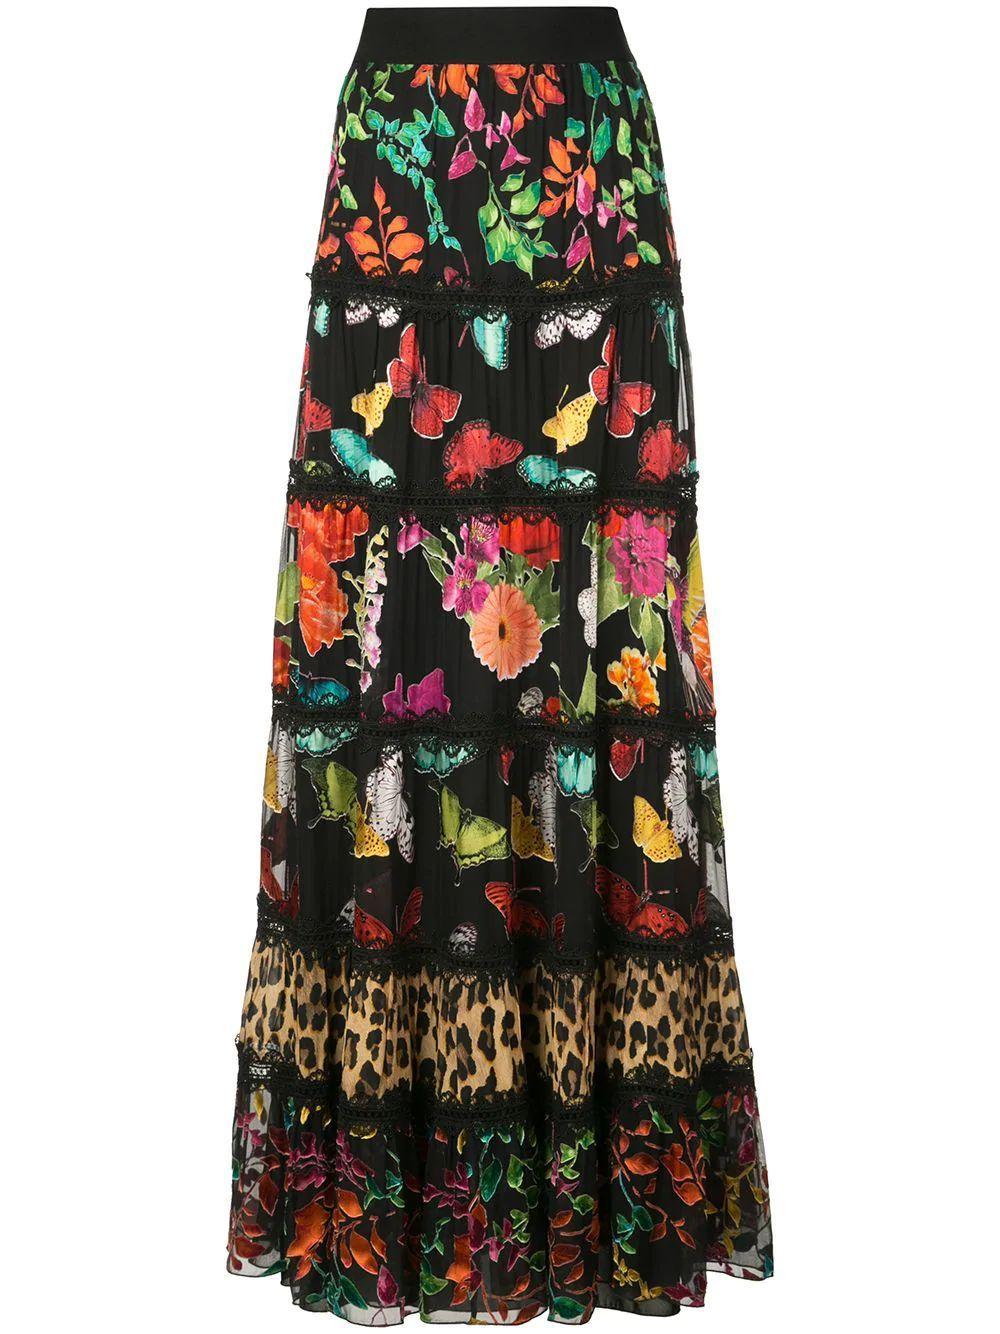 Lesa Paneled Maxi Skirt Item # CC909B45307